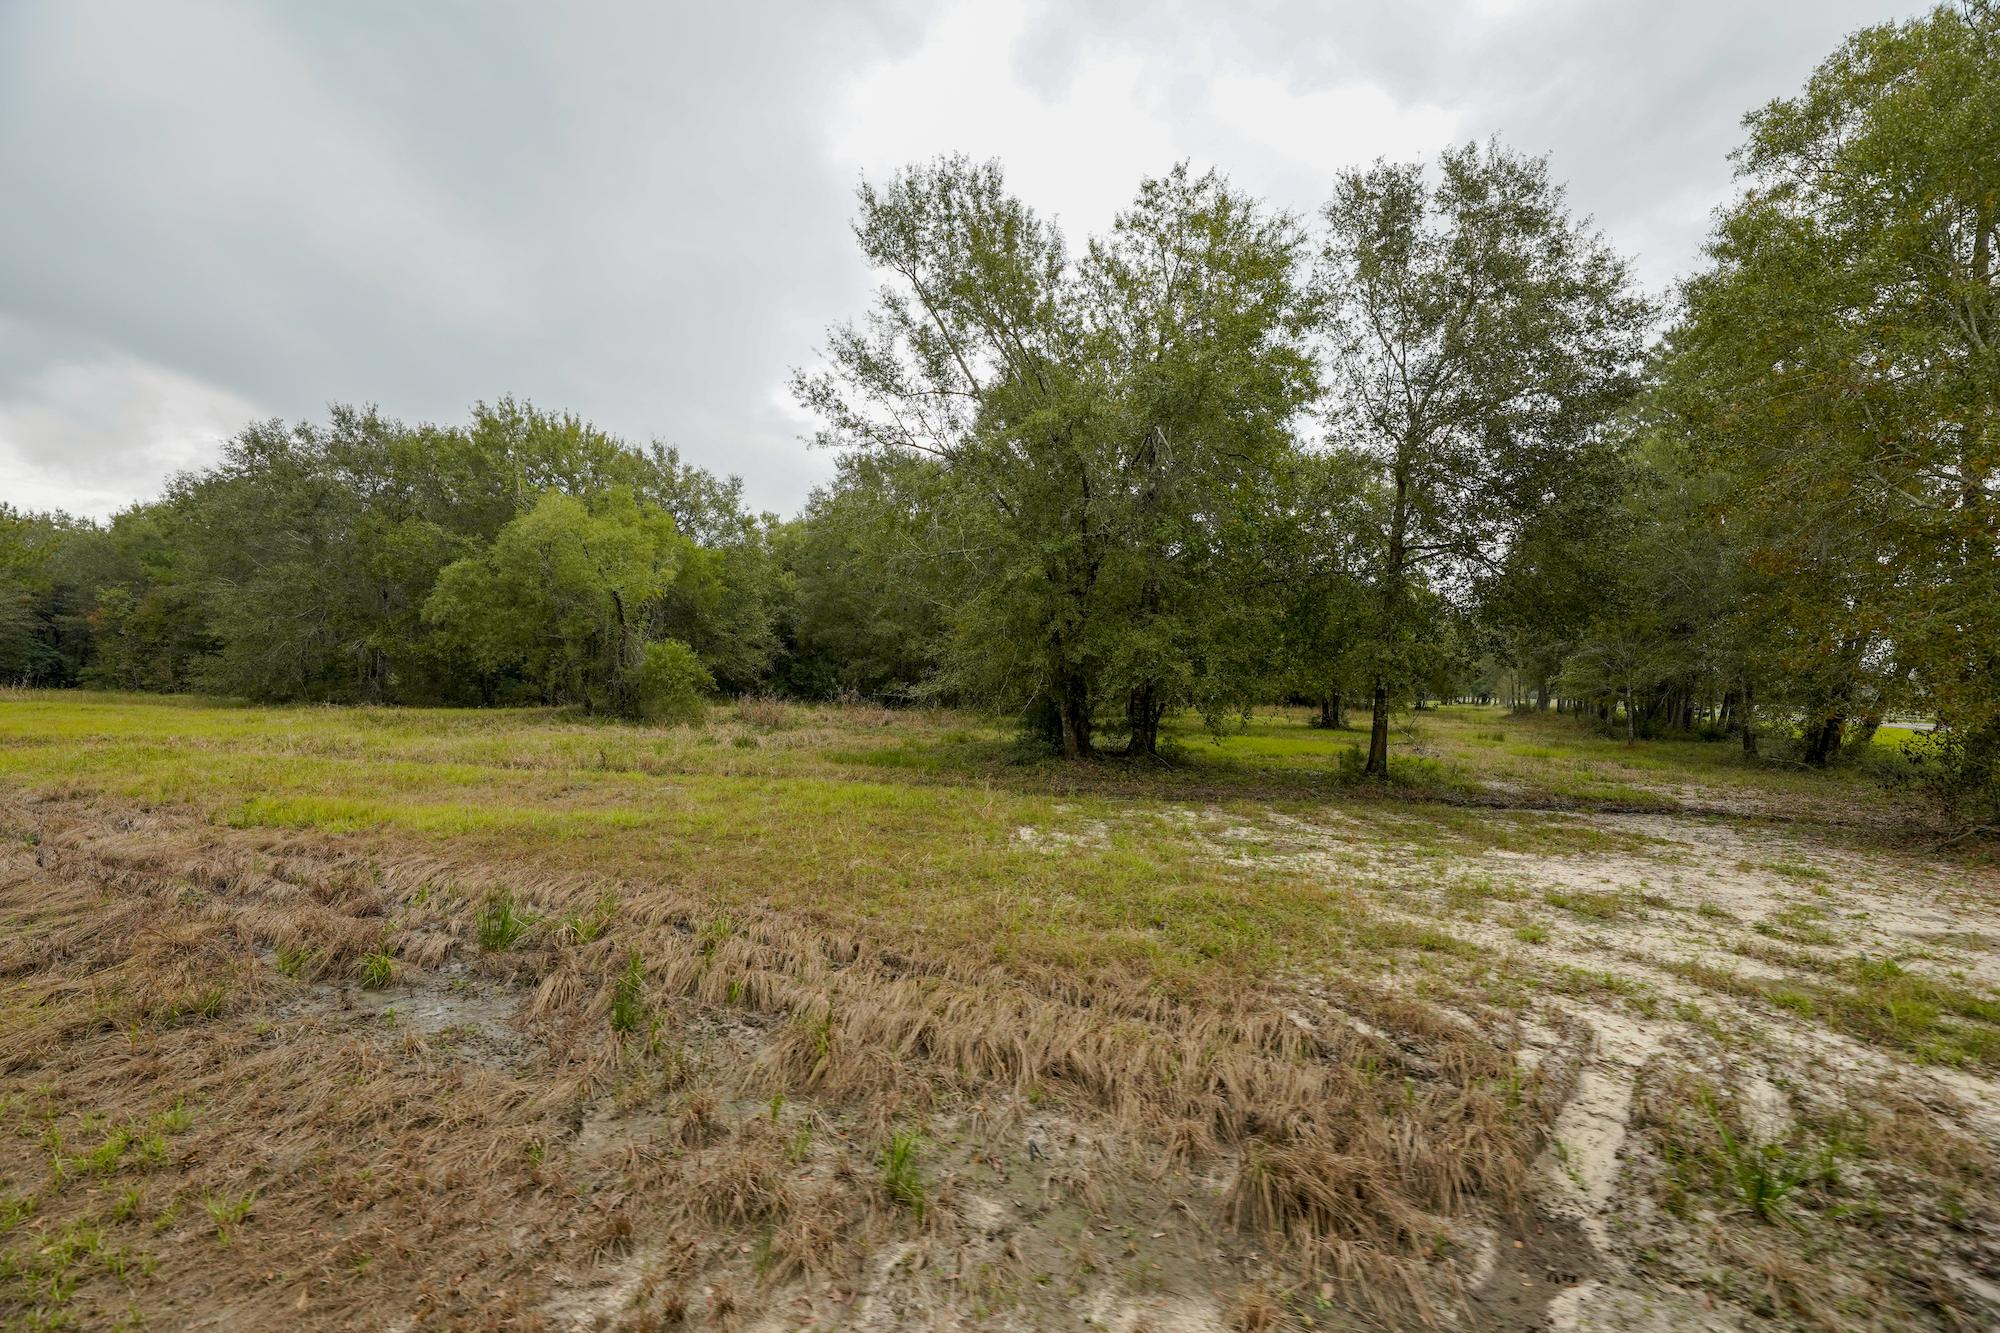 Jefferson County Development Land - Image 25 of 36